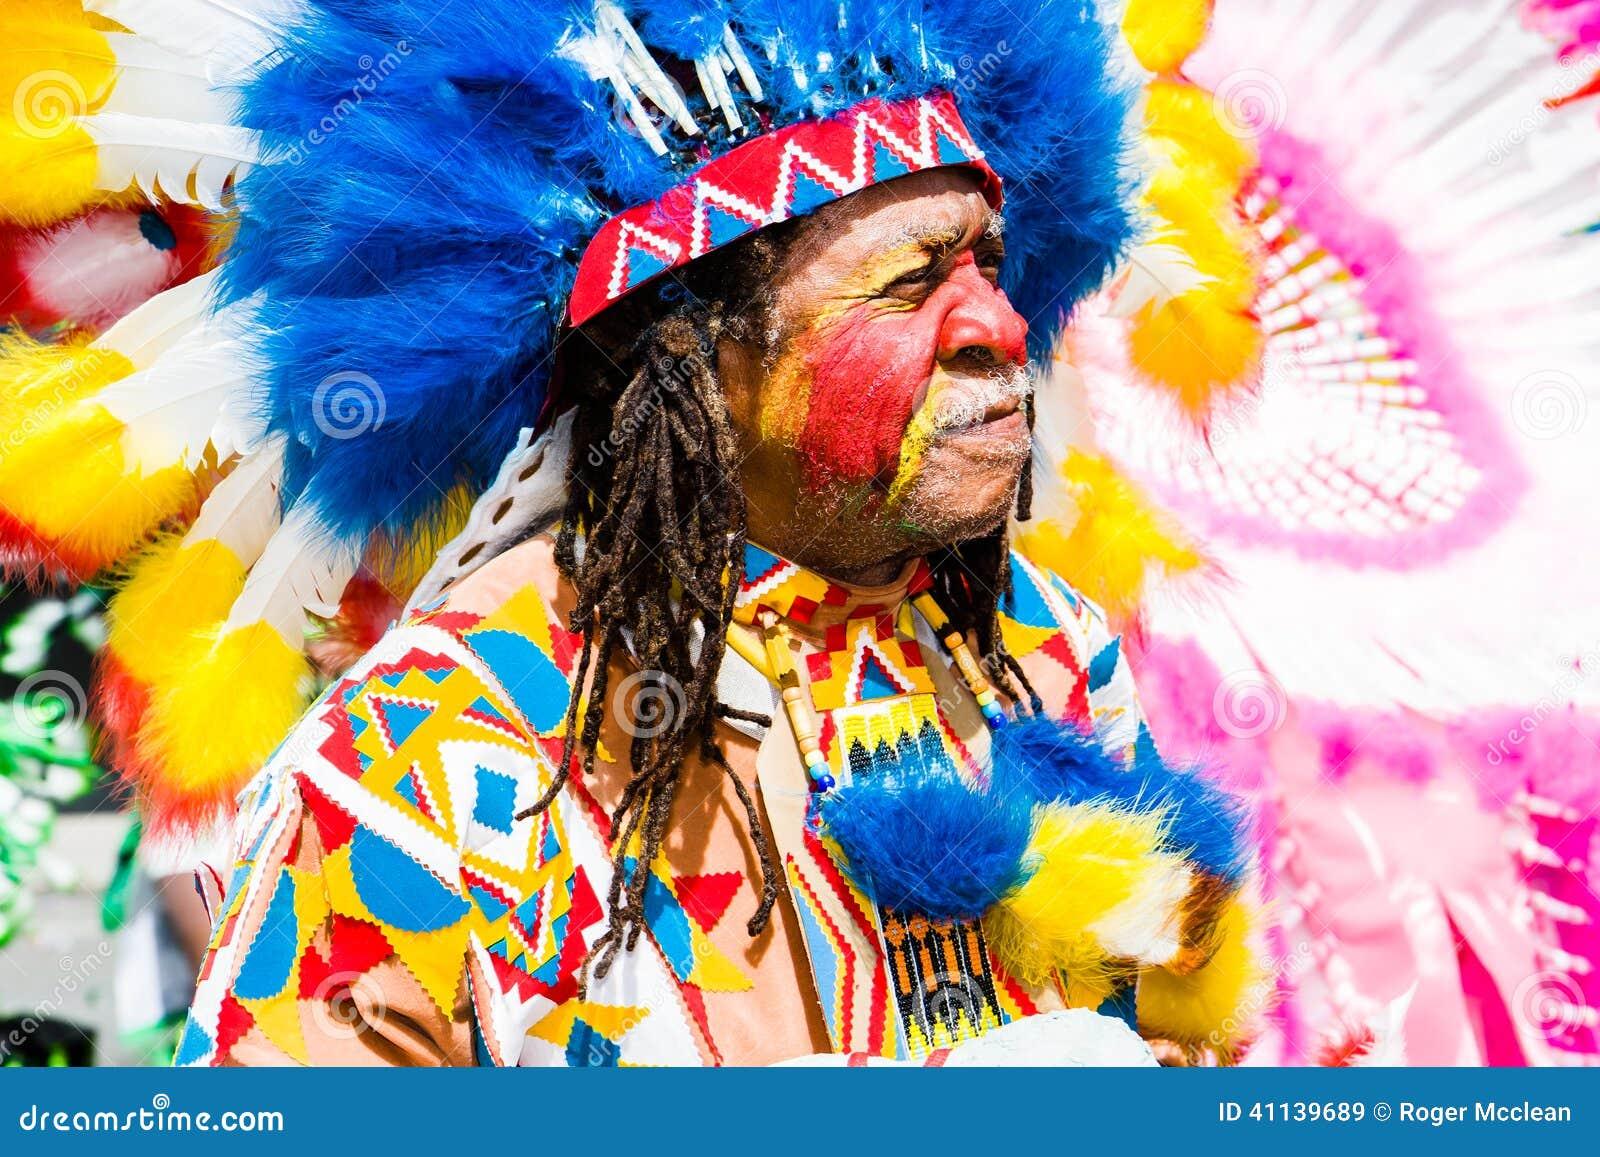 Jefe del carnaval